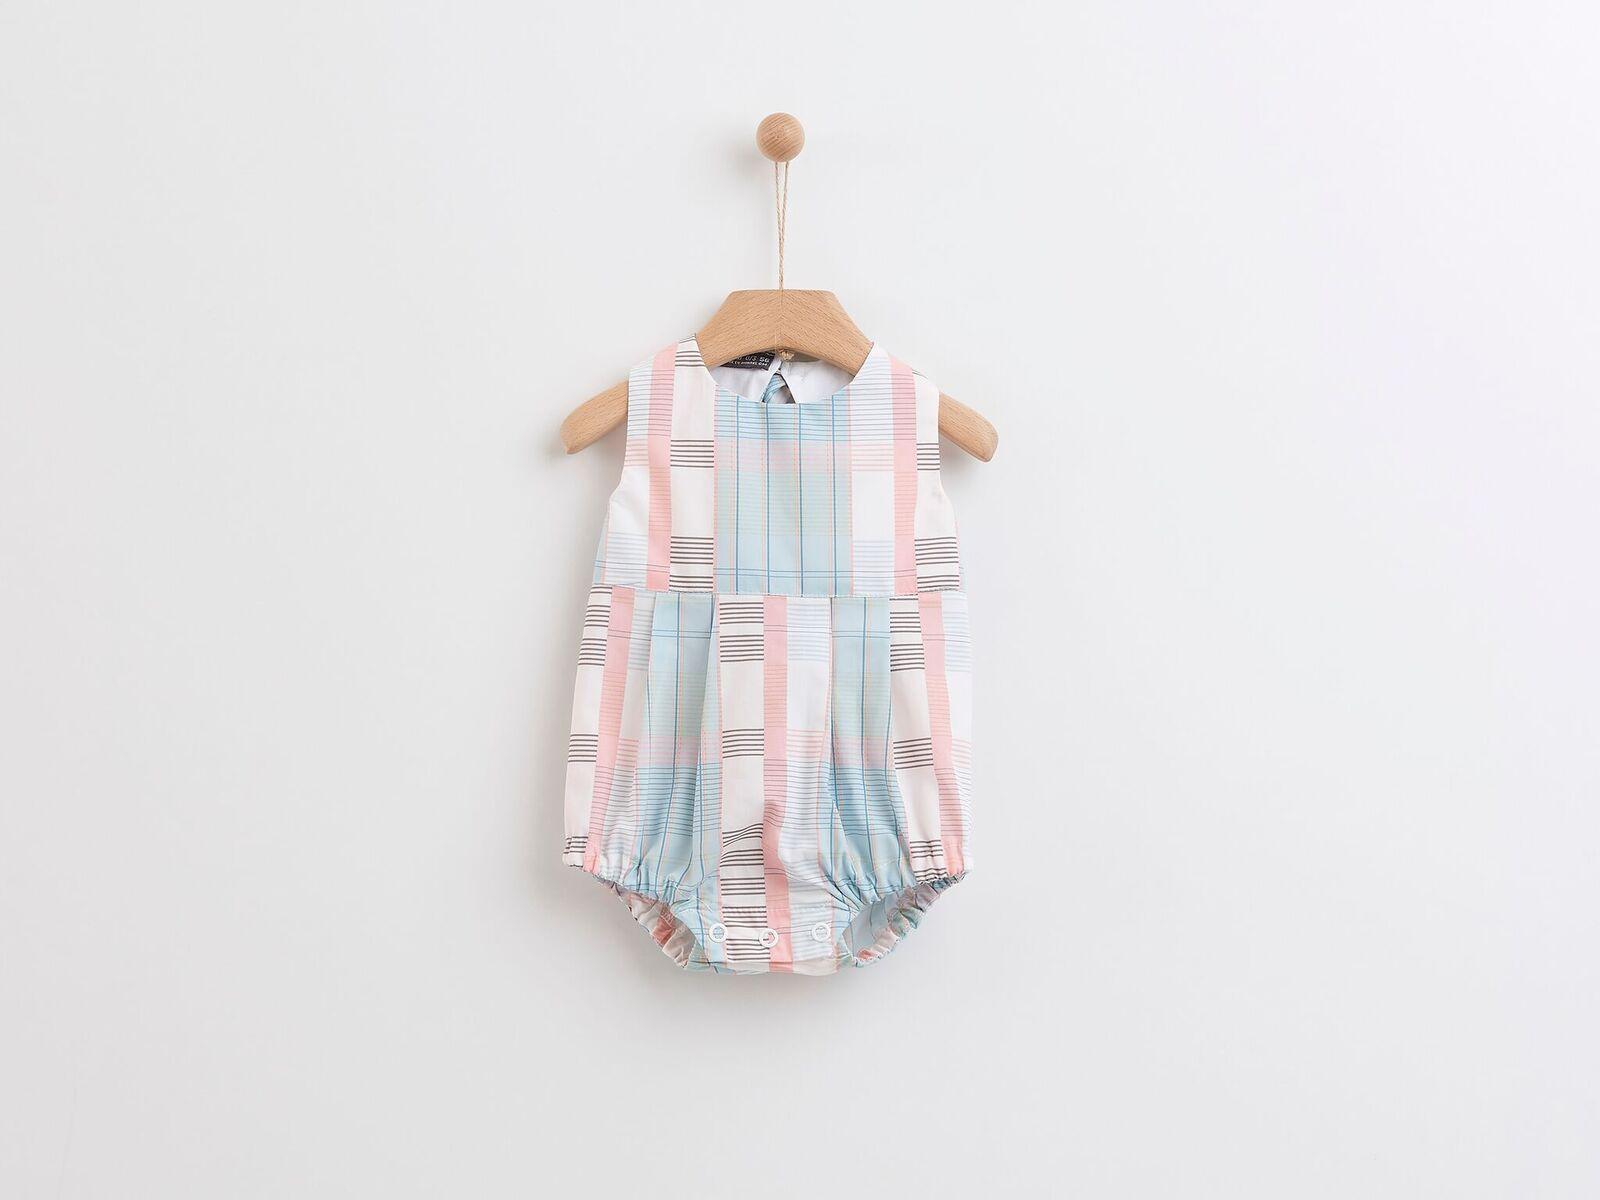 012530cbf673 Φουφούλα με ανοιχτή πλάτη | Baby Love Kalamata